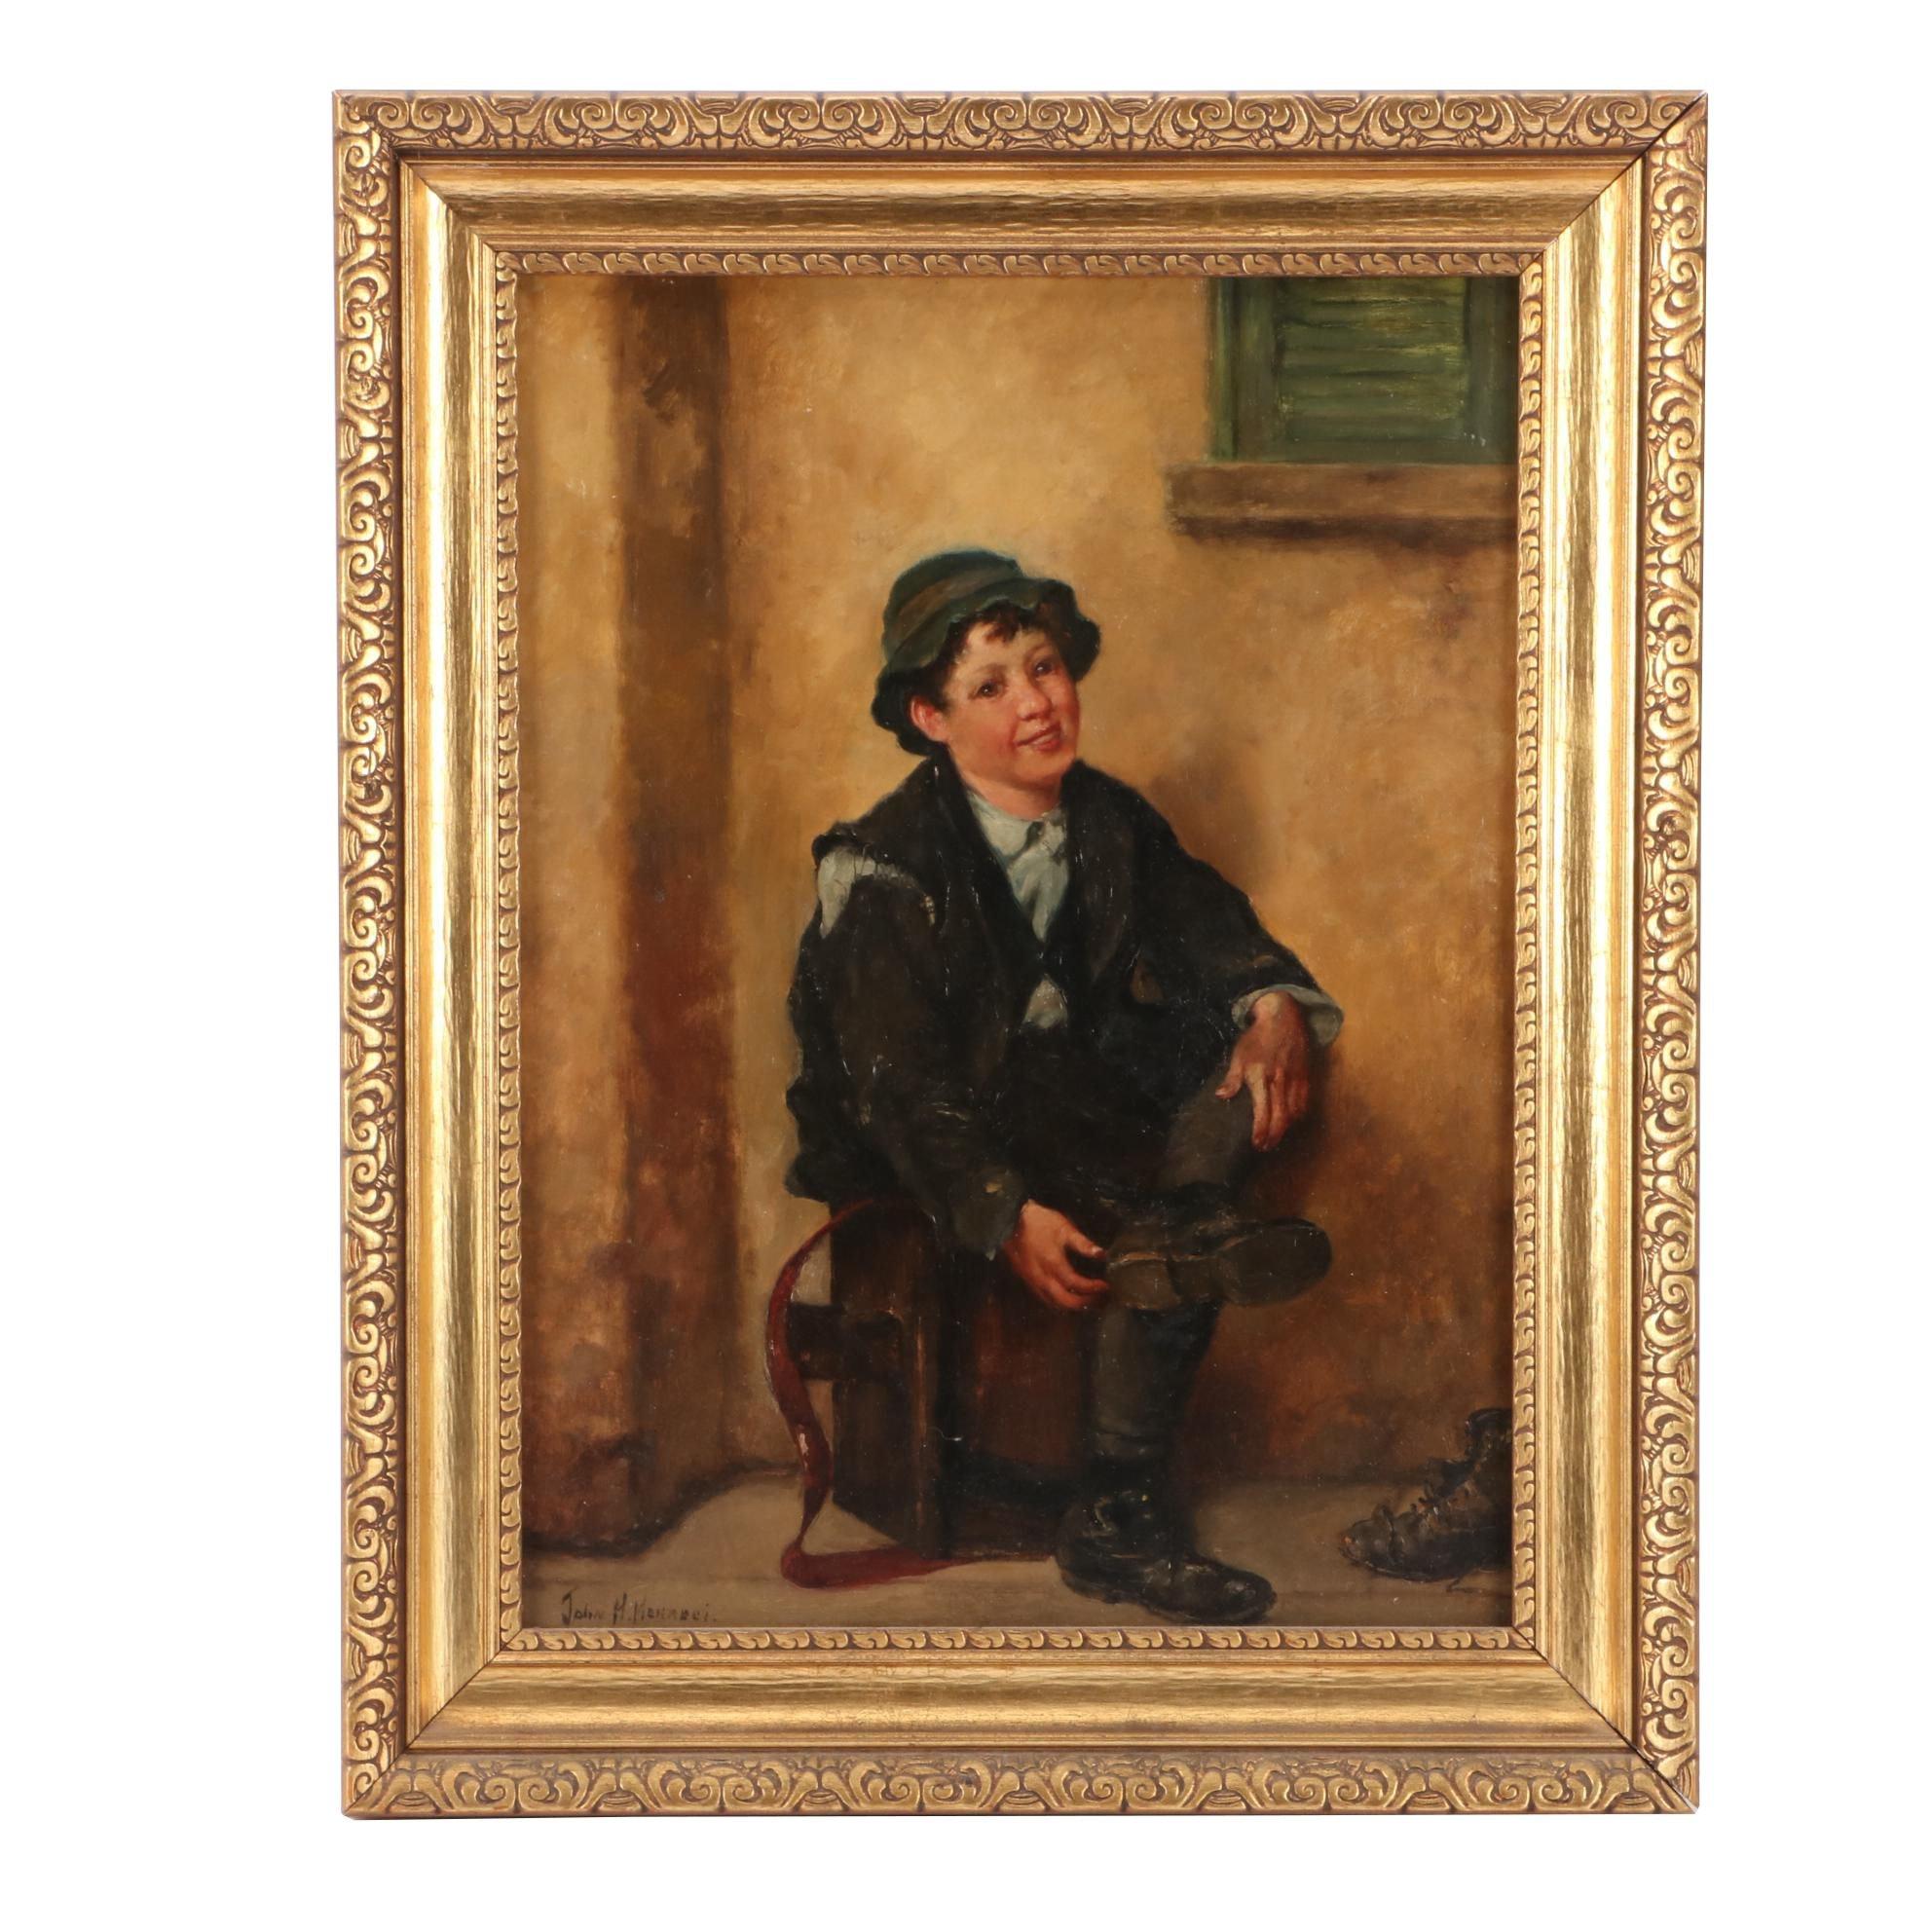 John Henry Henrici Genre Portrait Oil Painting of Shoeshine Boy